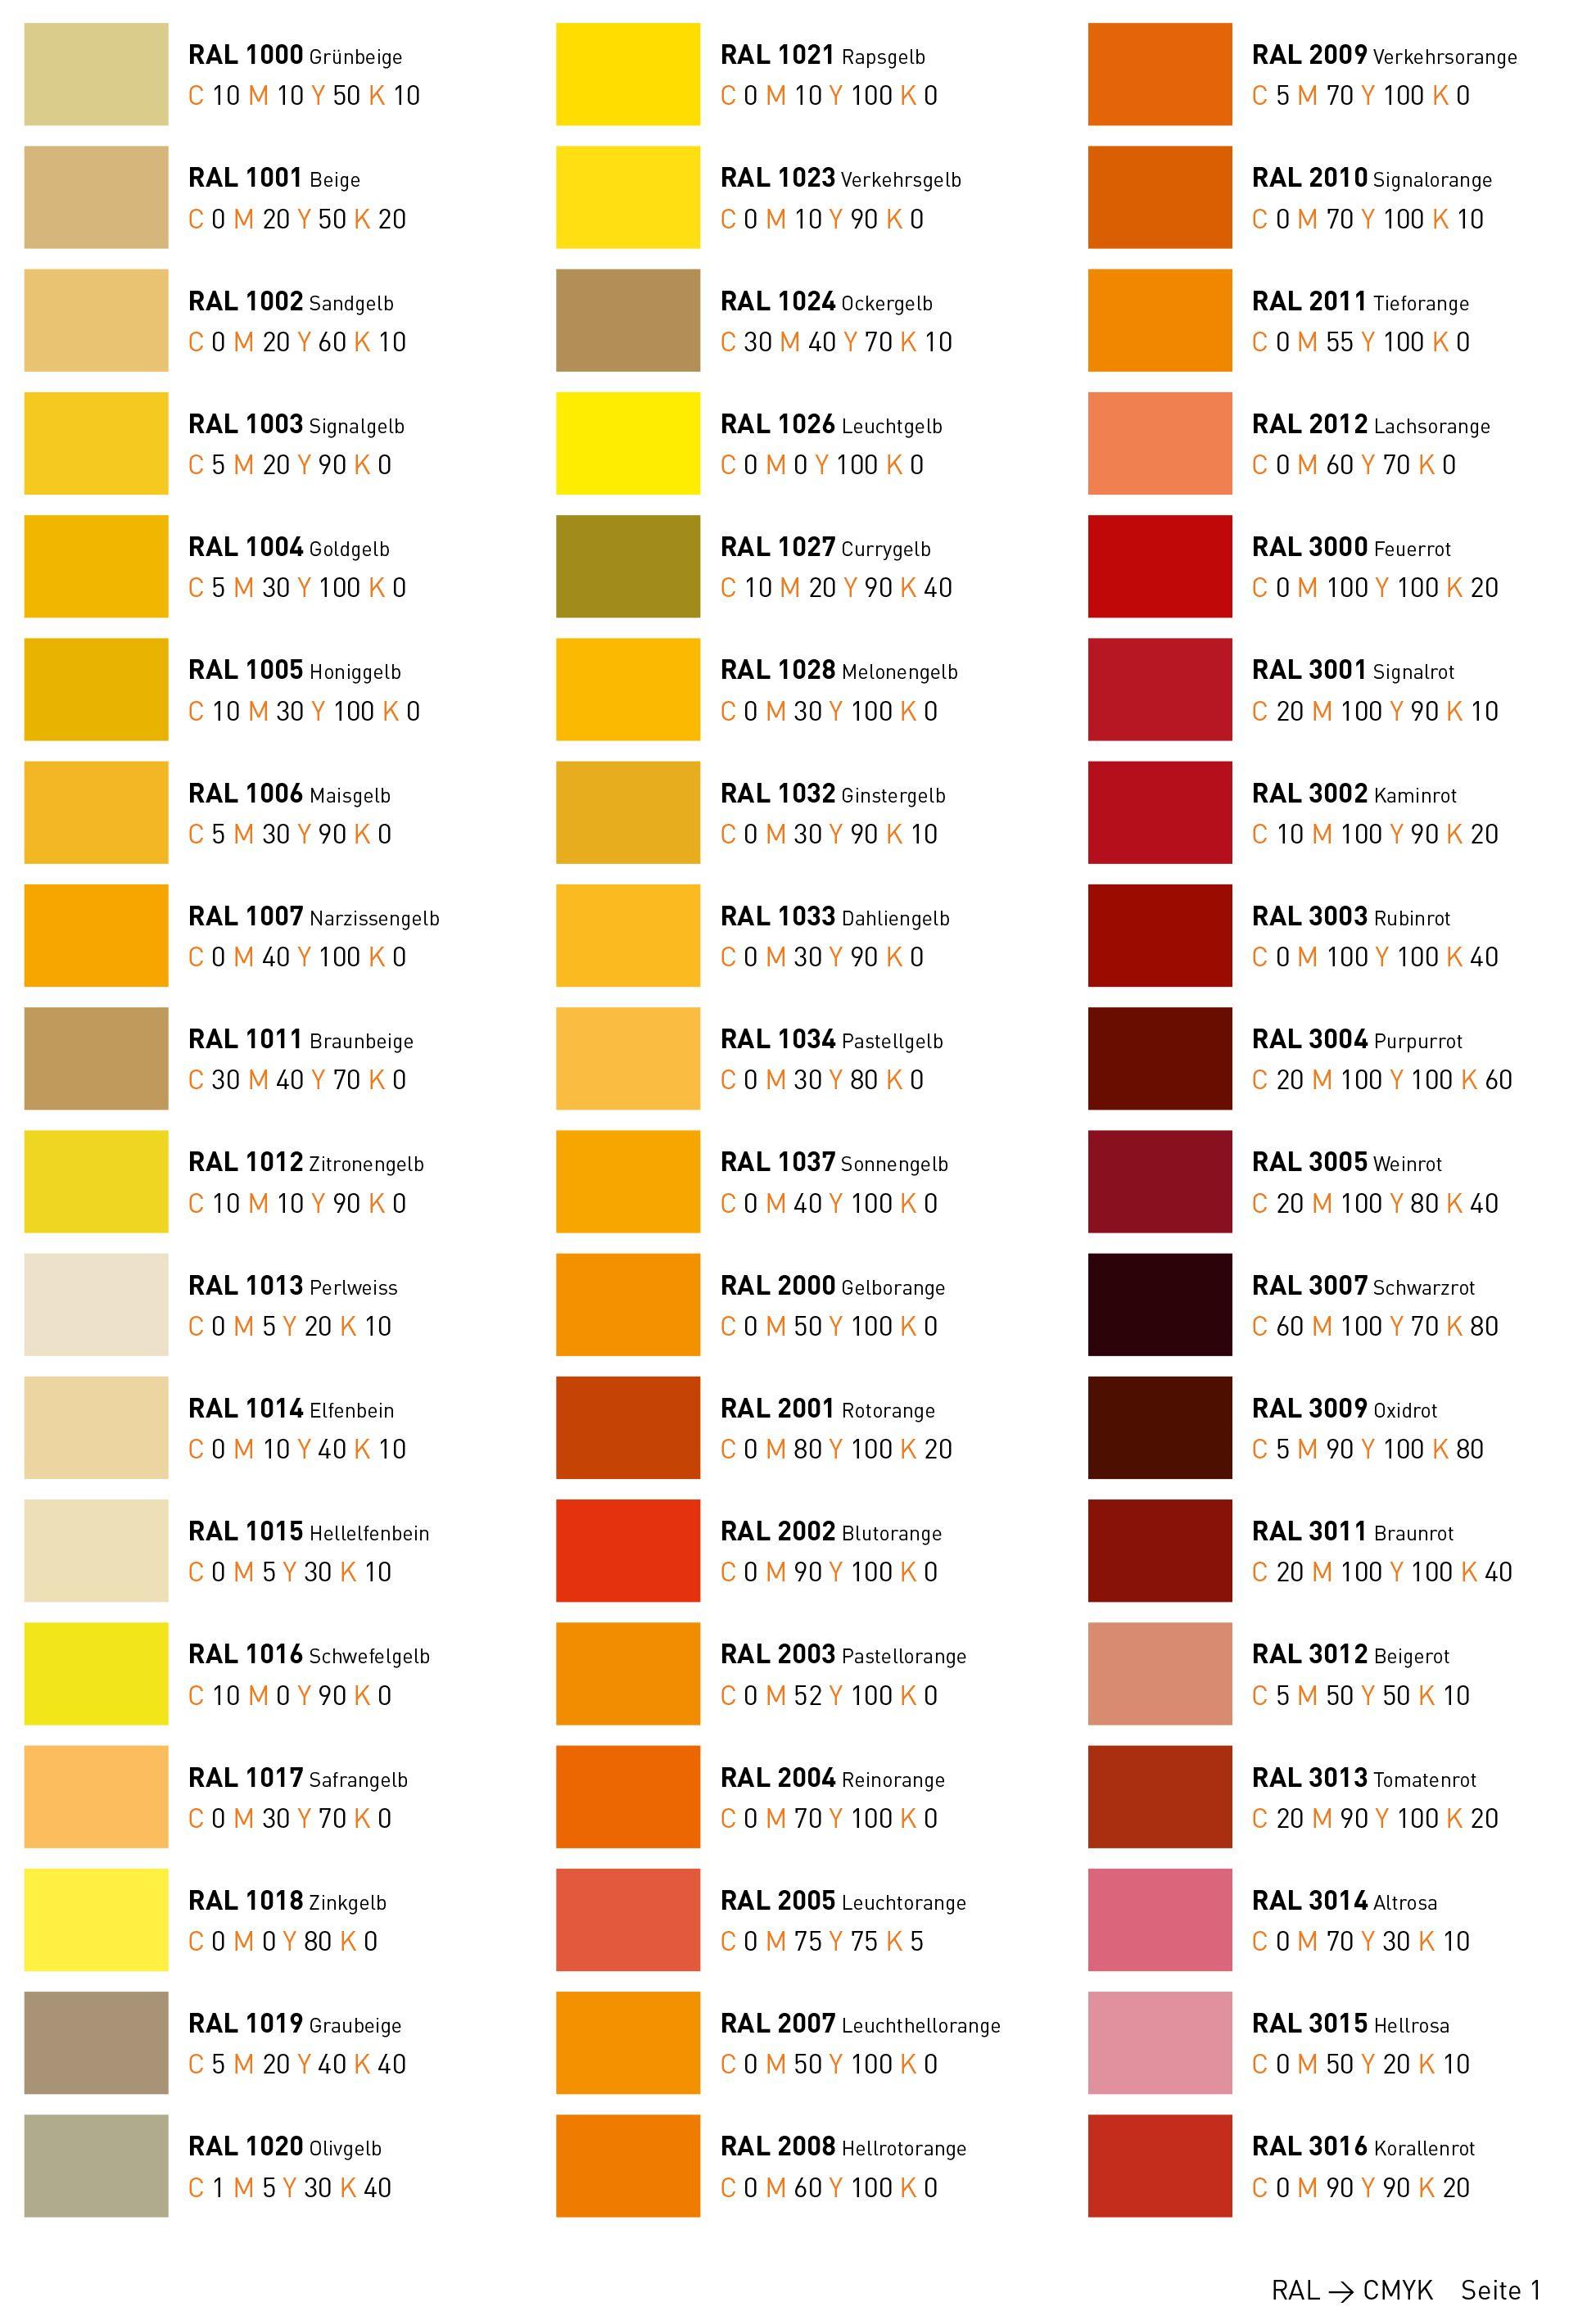 Ral Cmyk Http Www Neumann Werbetechnik De Sod Data Basis Download Ral To Cmyk Pdf Cmyk Color Chart Pantone Colour Palettes Color Mixing Chart